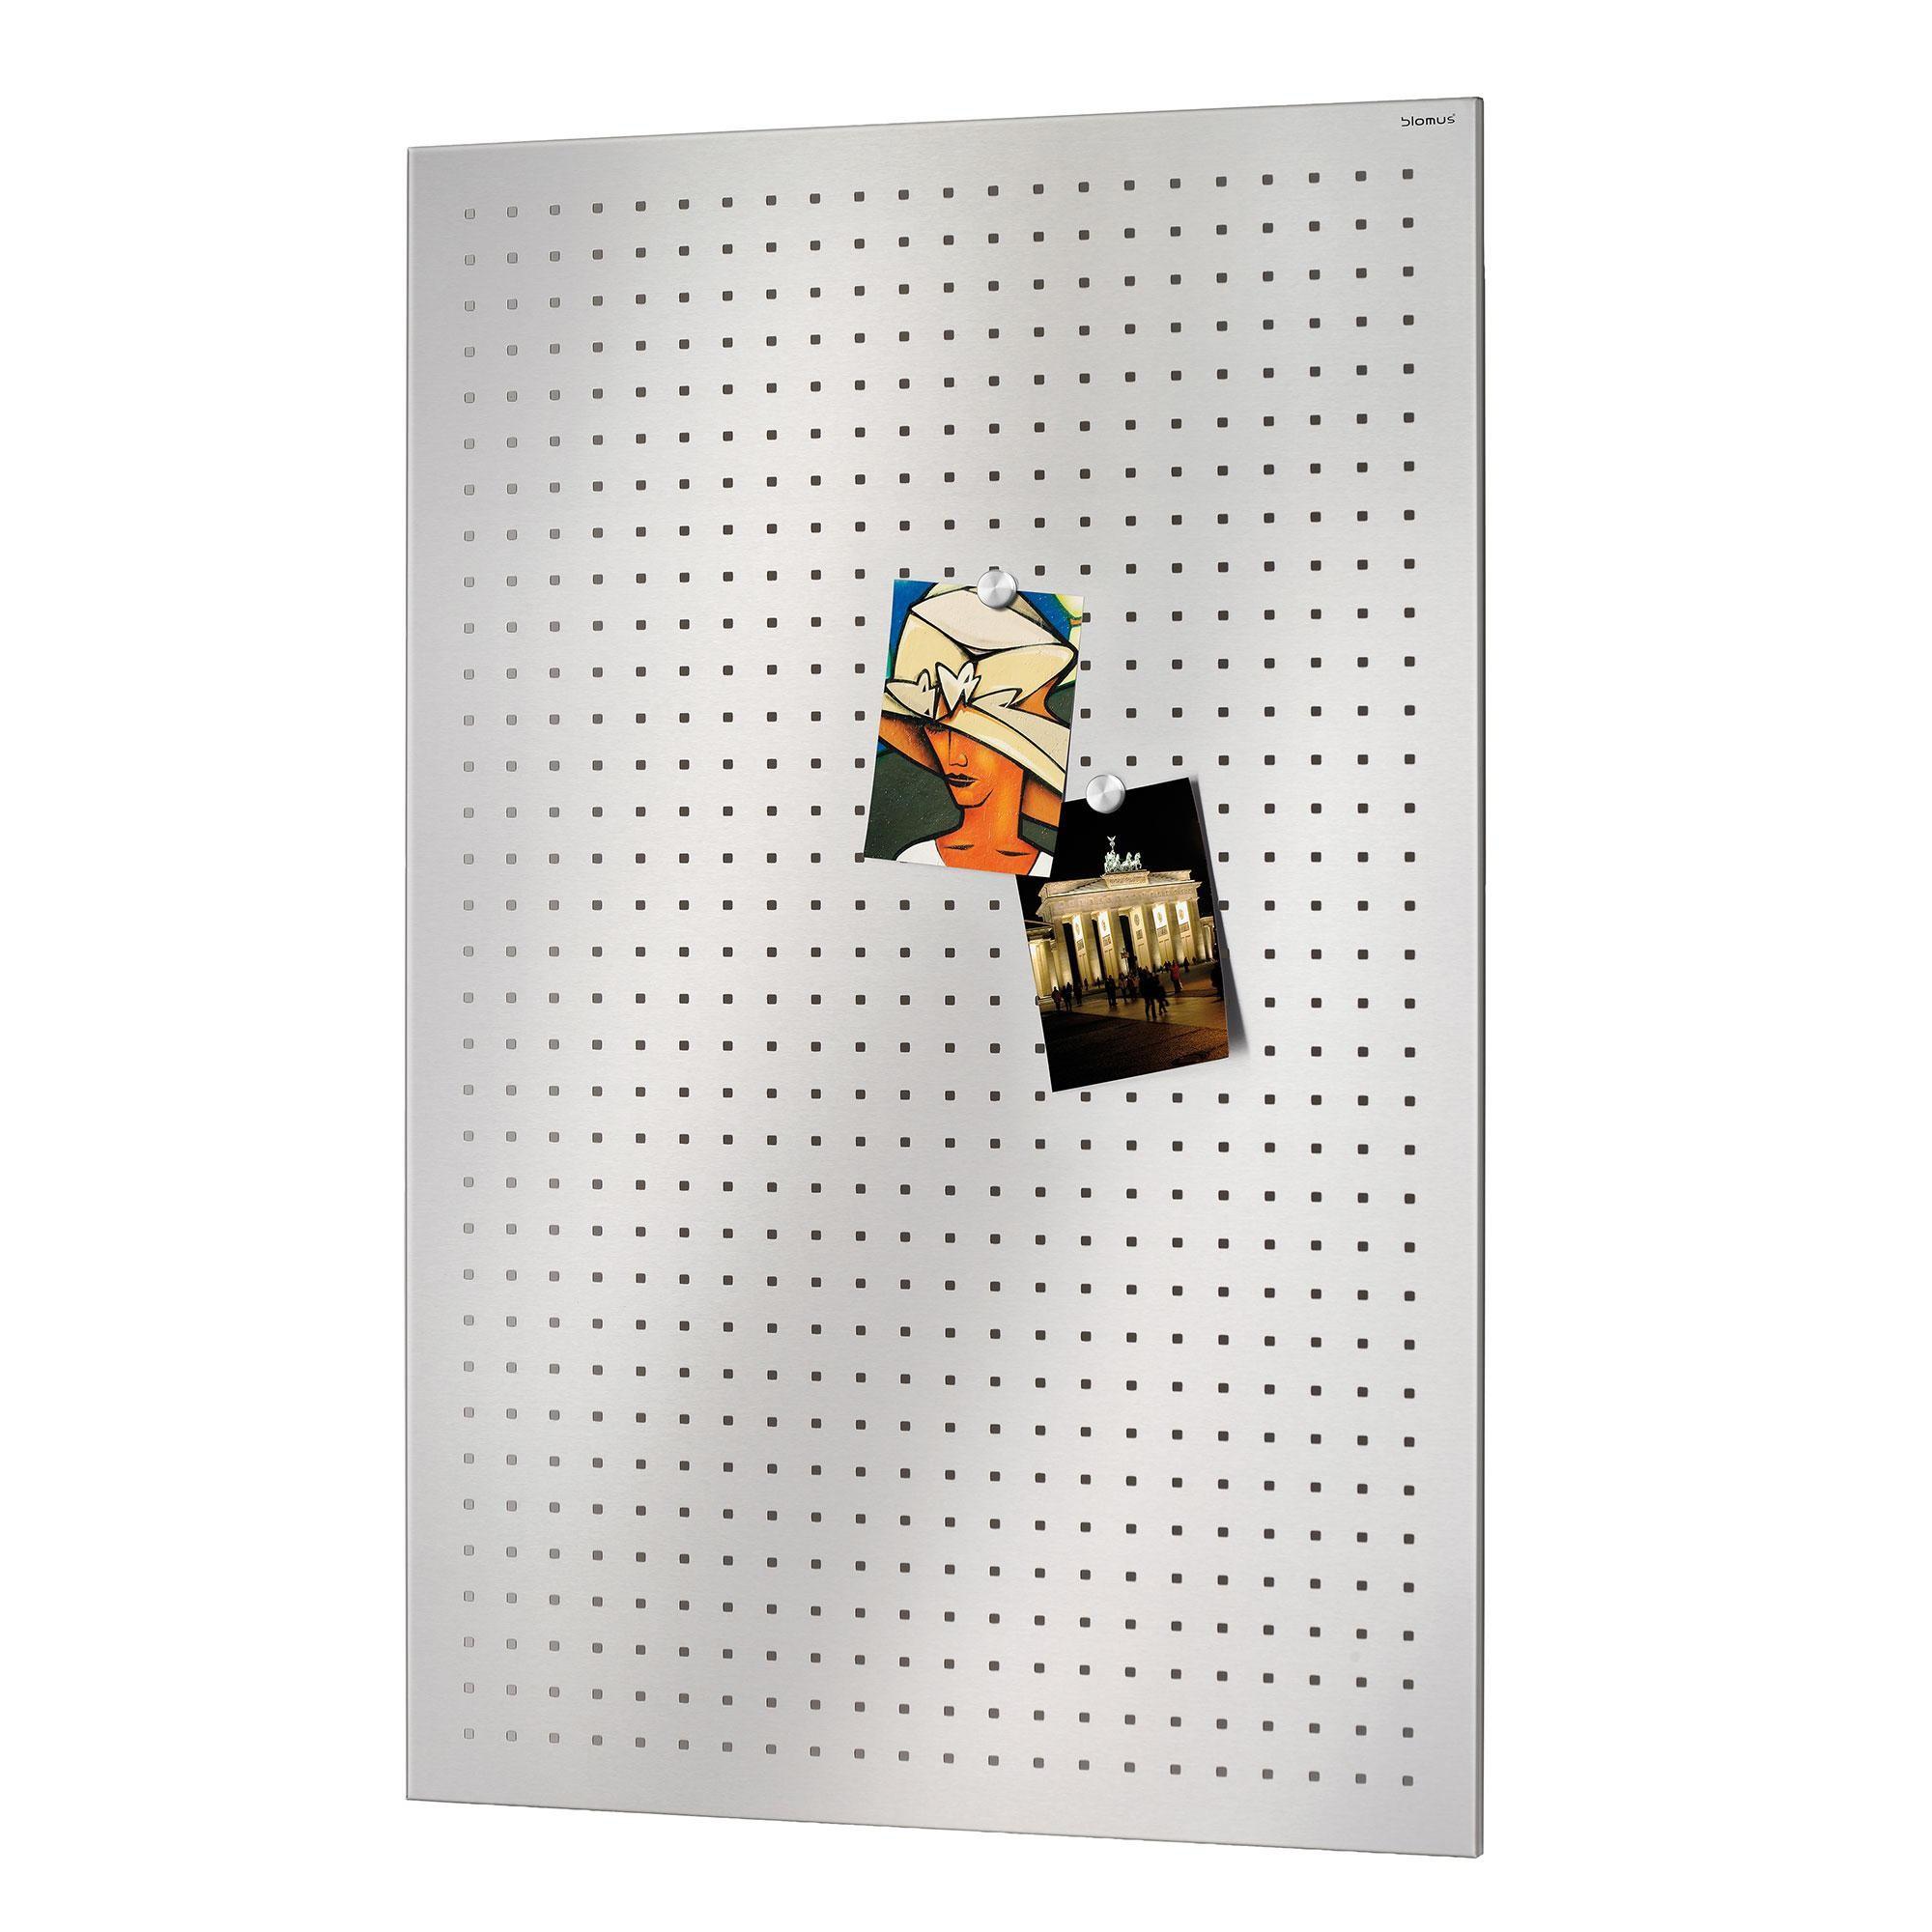 blomus muro tableau magn tique perfor ambientedirect. Black Bedroom Furniture Sets. Home Design Ideas